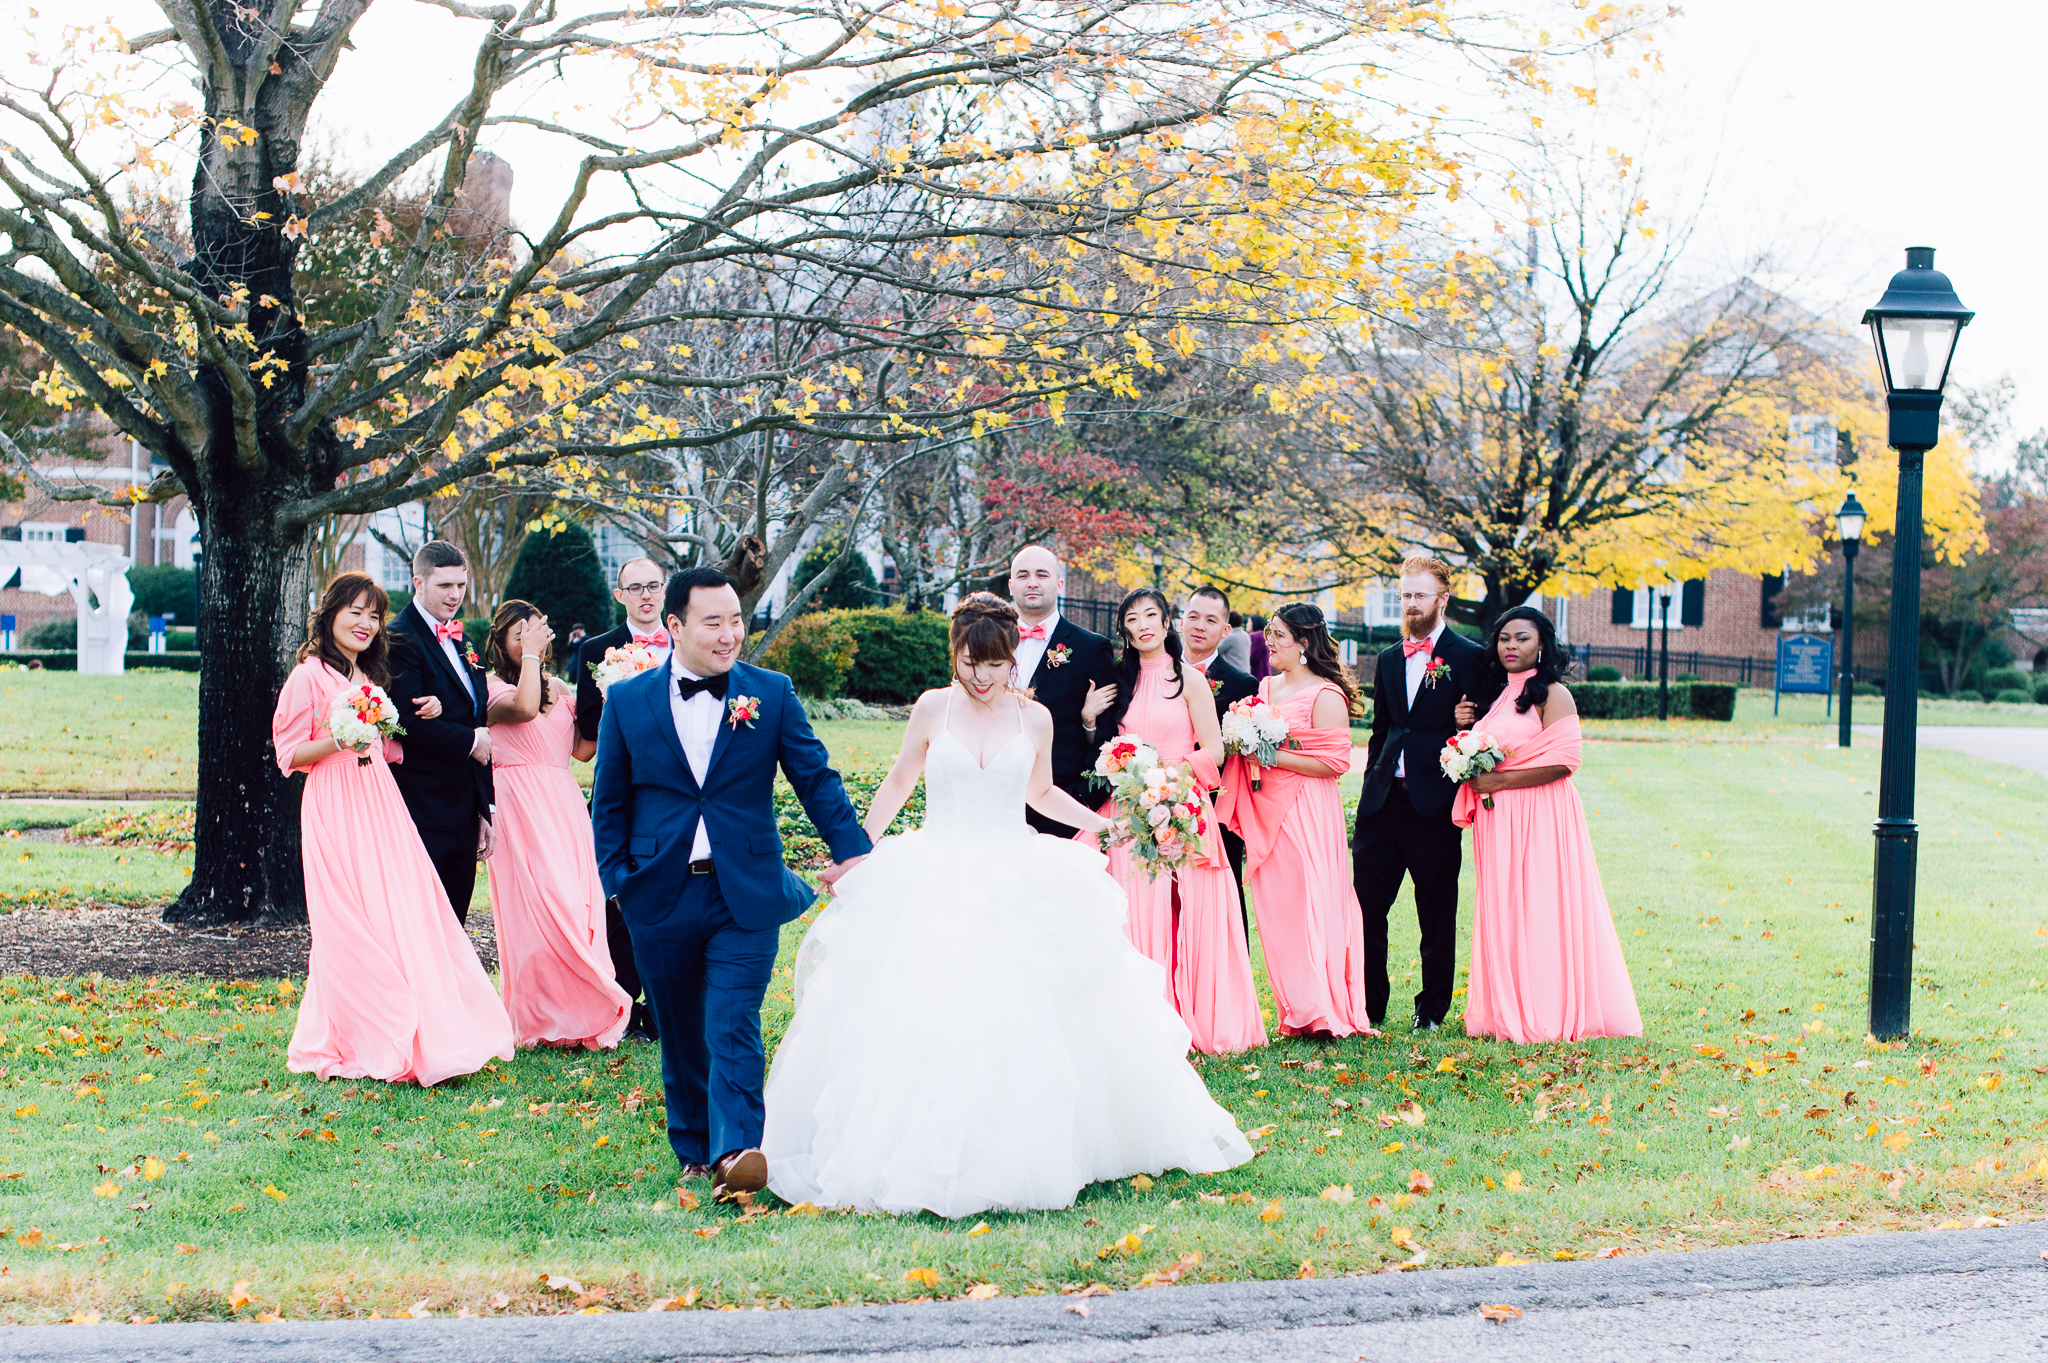 youseephotography_virginiawedding_fall_VirginiaCrossings_KatieKevin (57).jpg